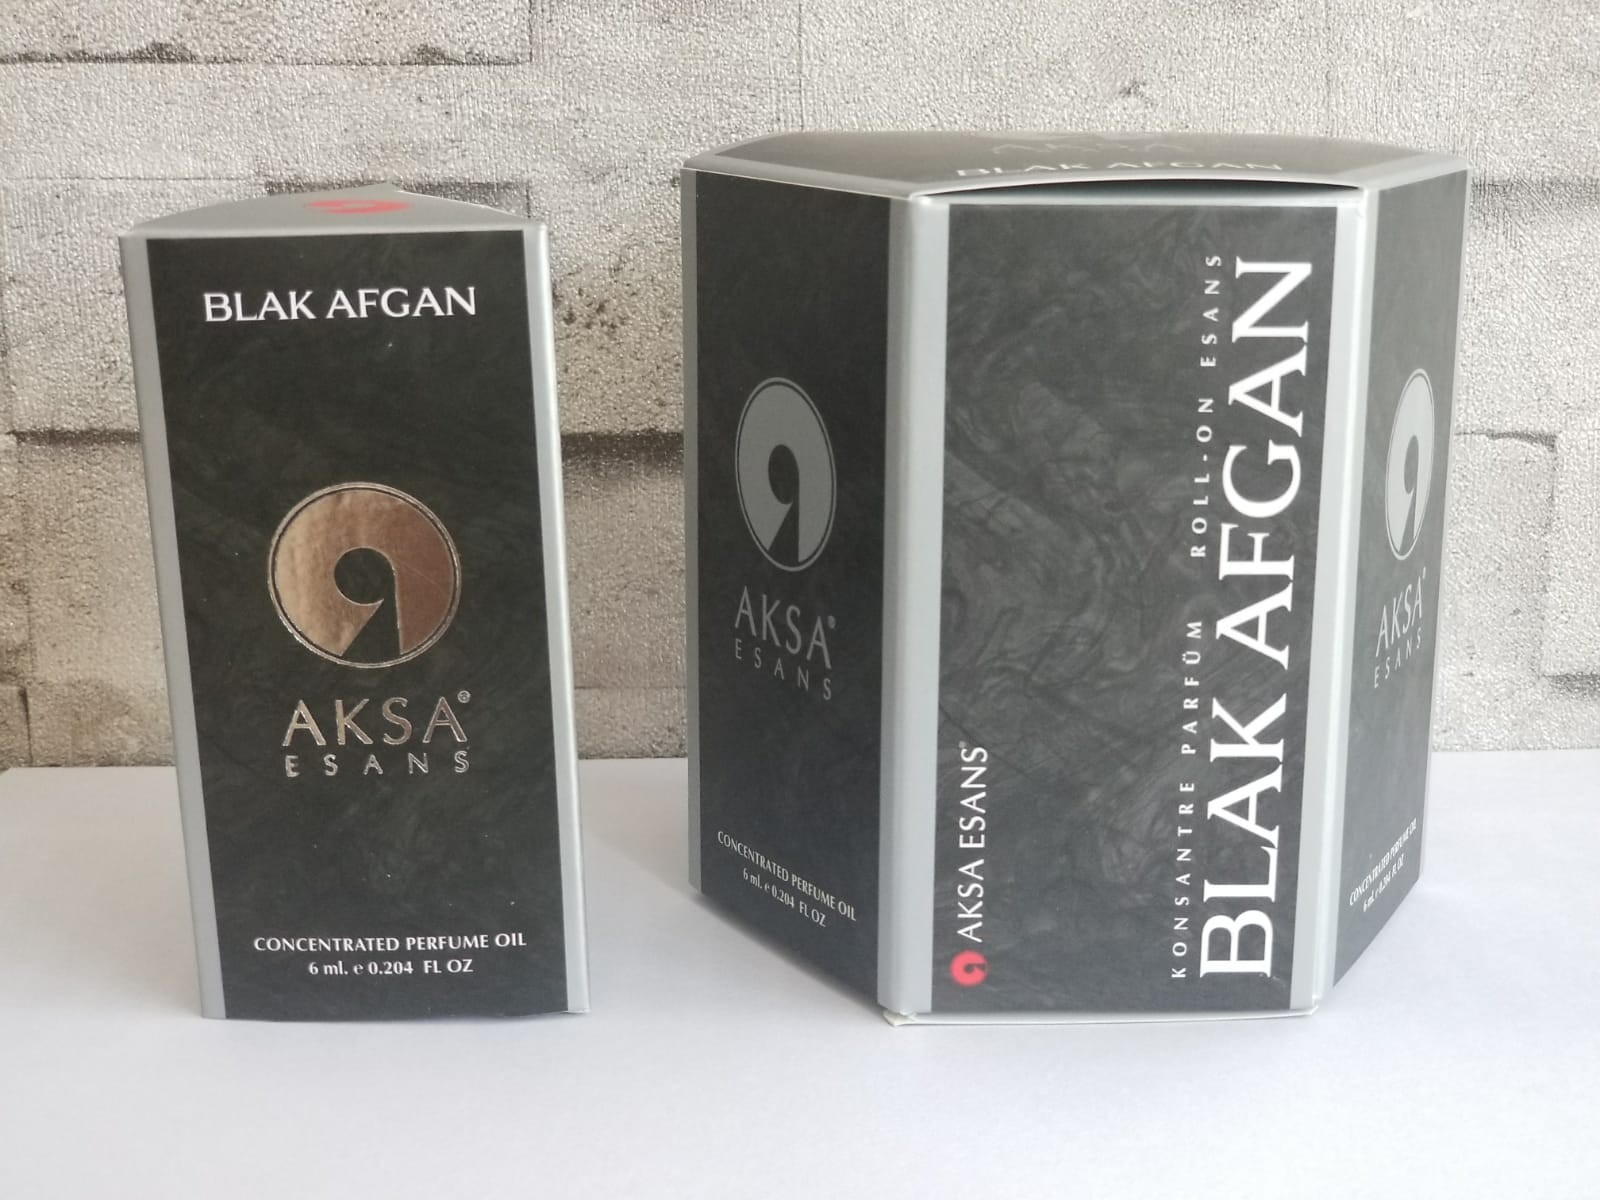 Aksa Esans Blak Afgan 6 ml